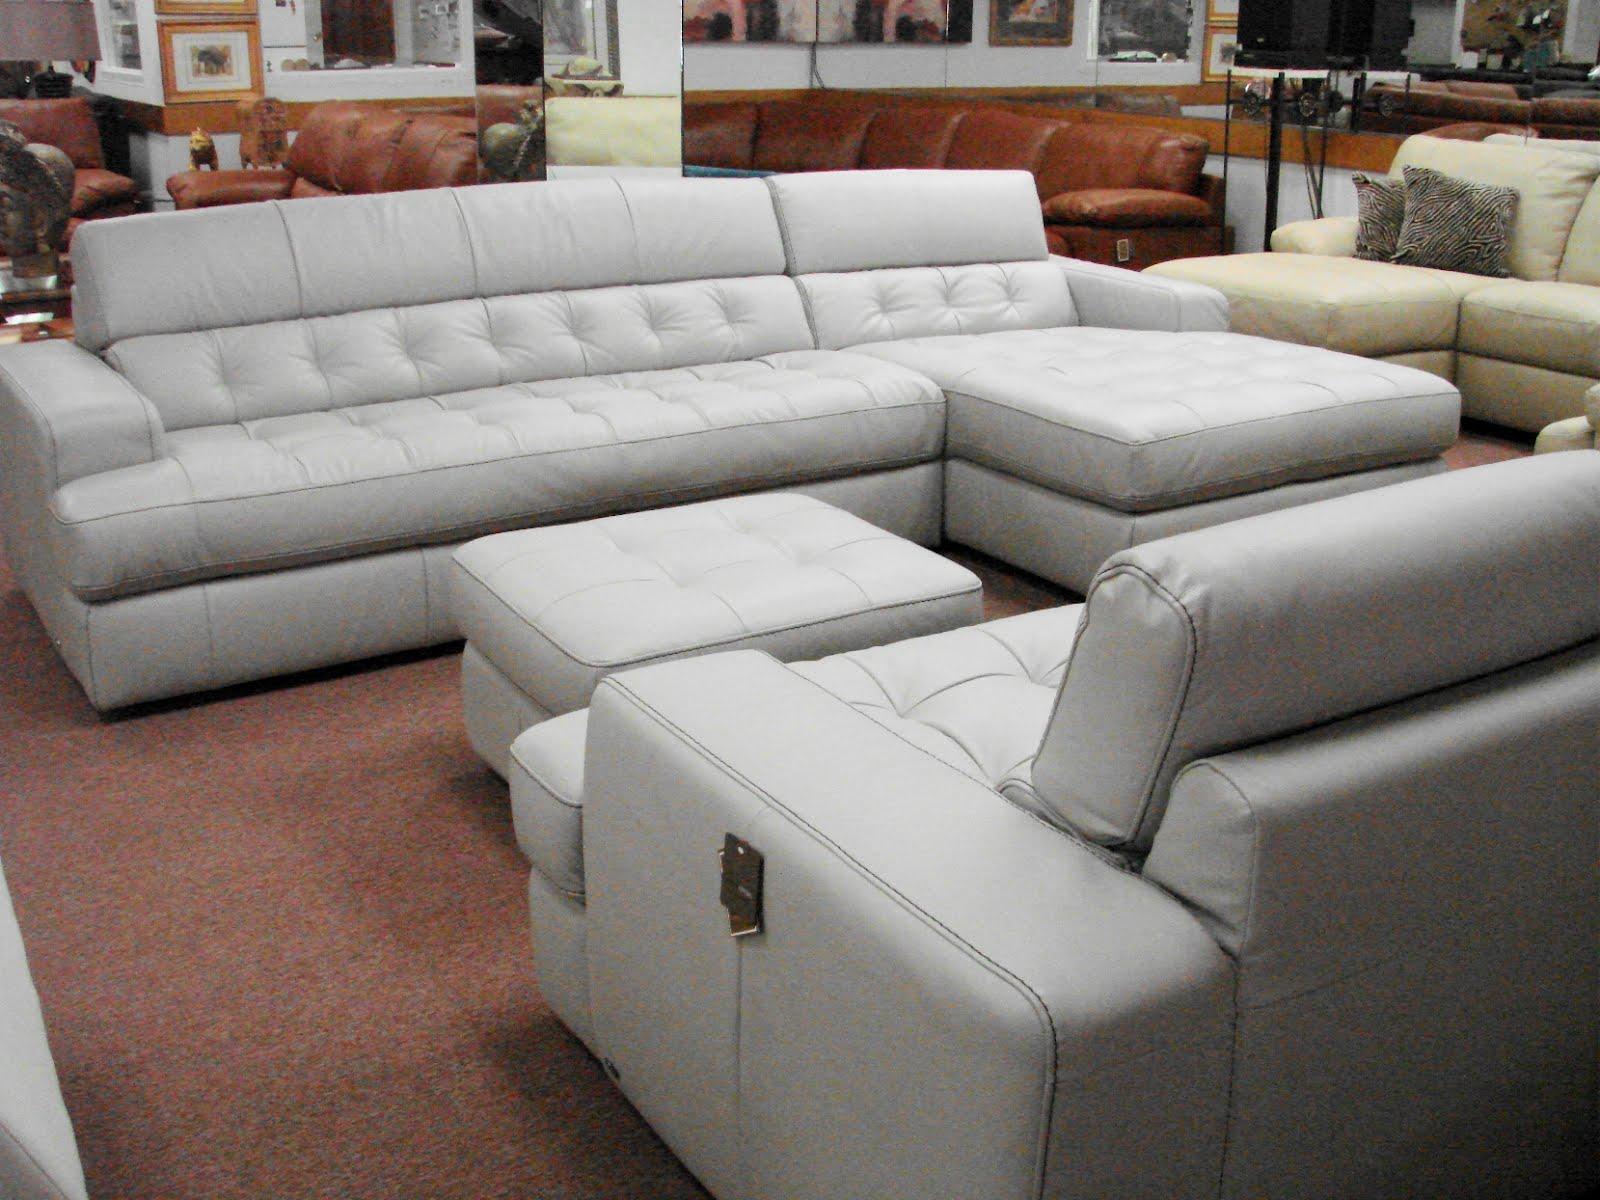 Natuzzi Editions by Interior Concepts Furniture BLOG Natuzzi